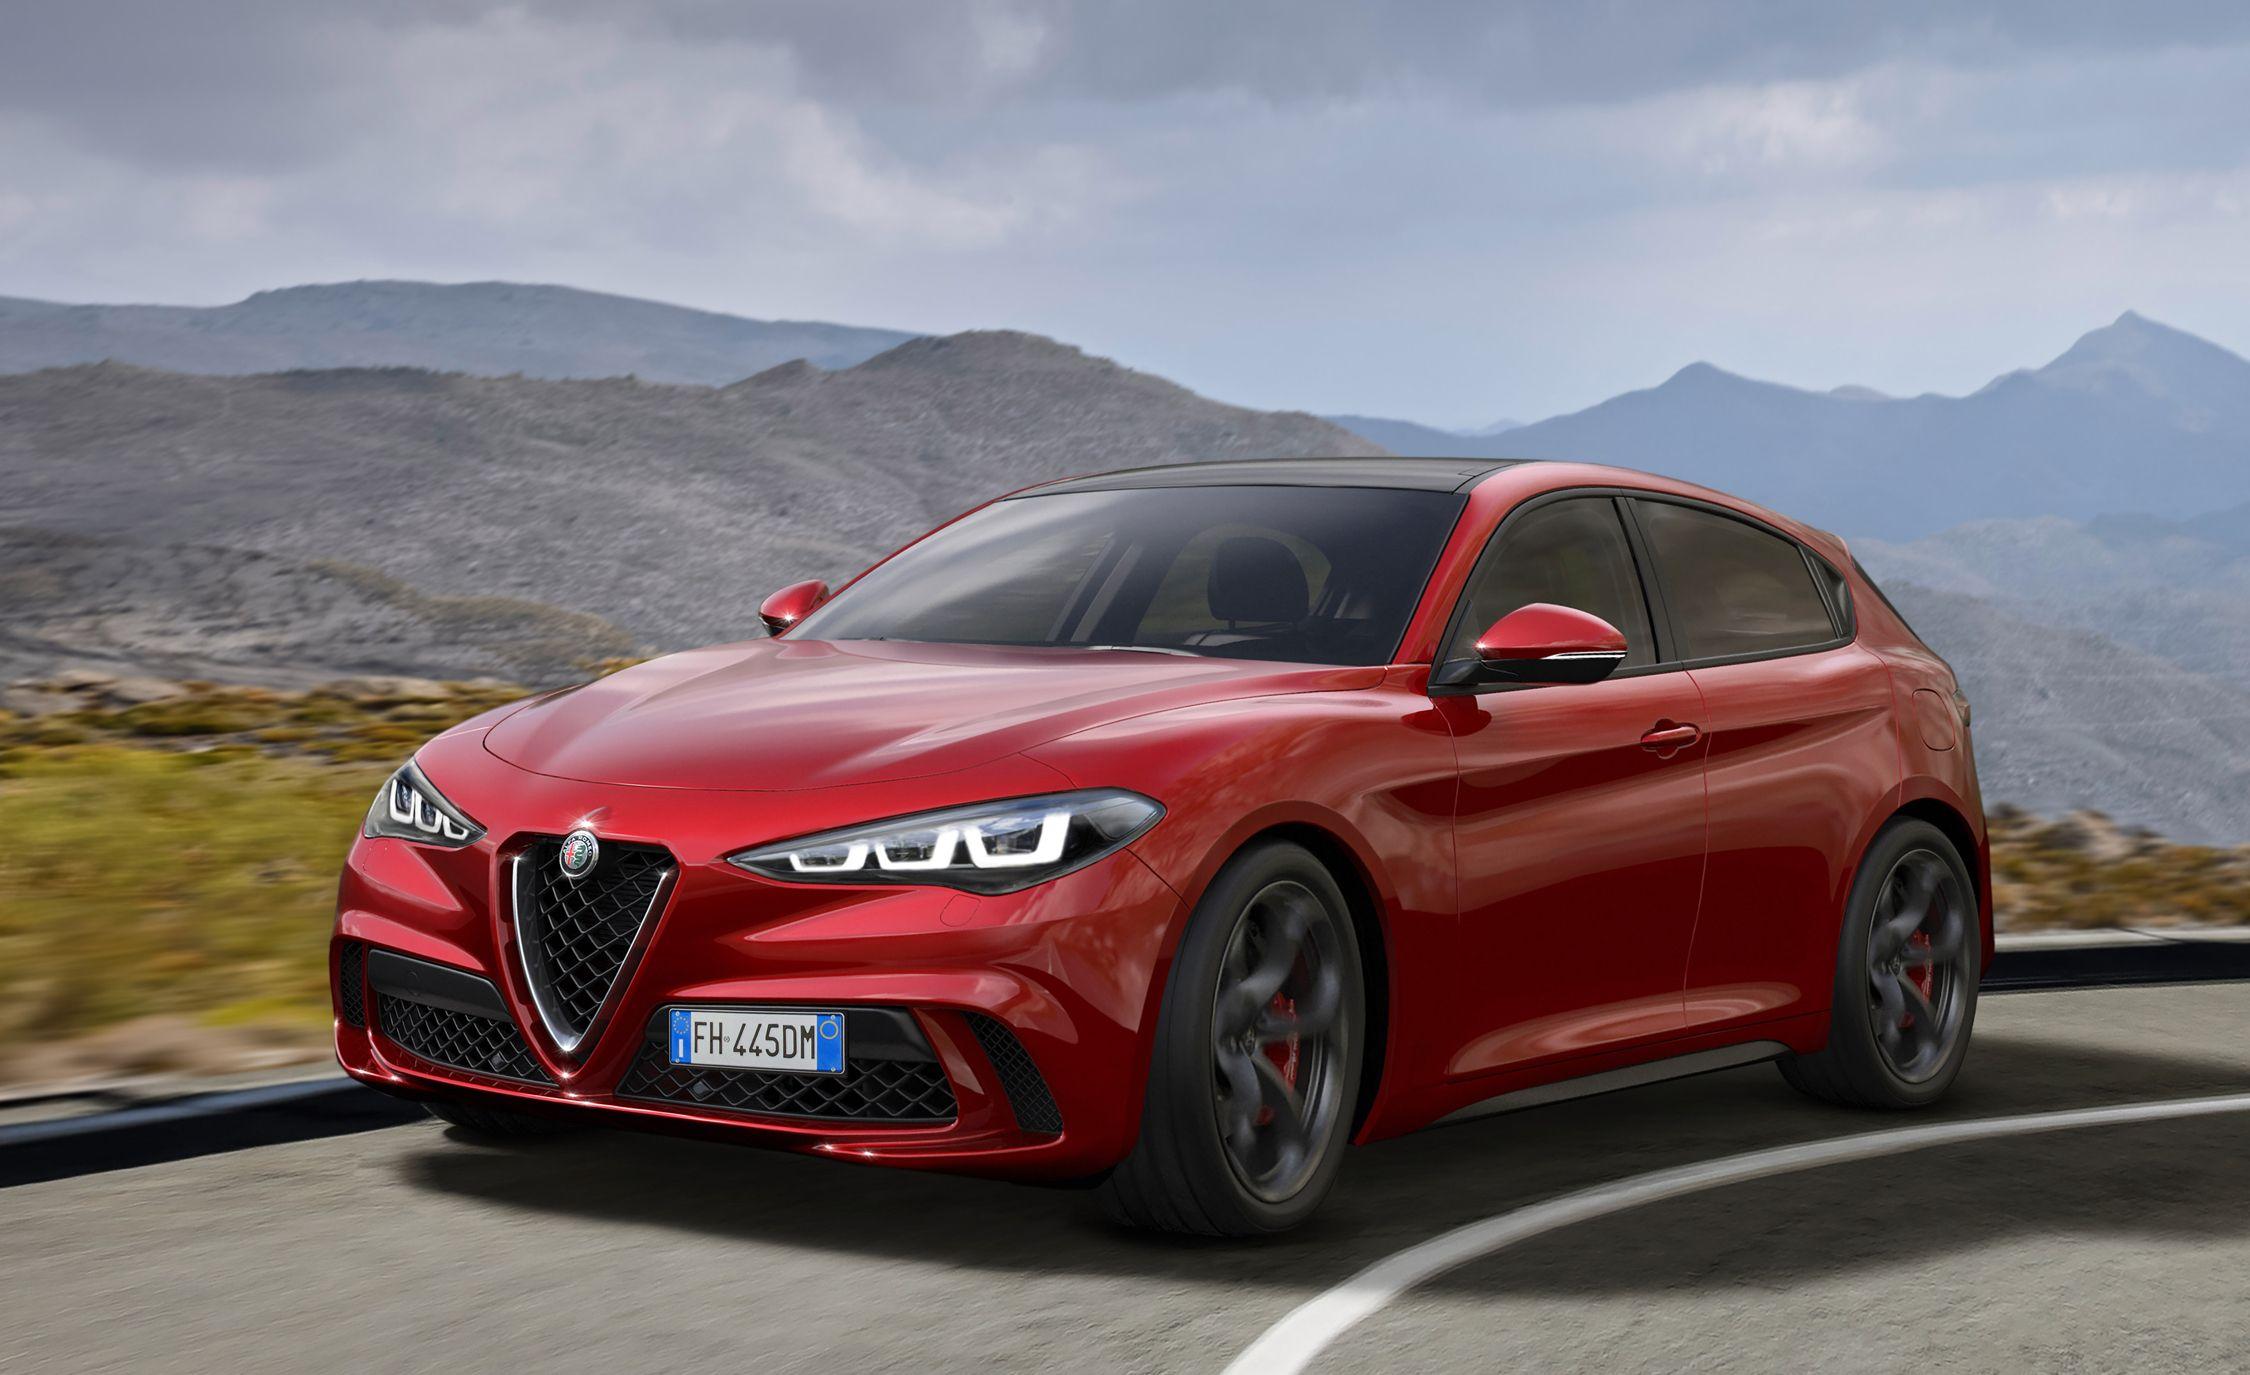 Alfa Romeo To Launch A New, Rear Wheel Drive Giulietta